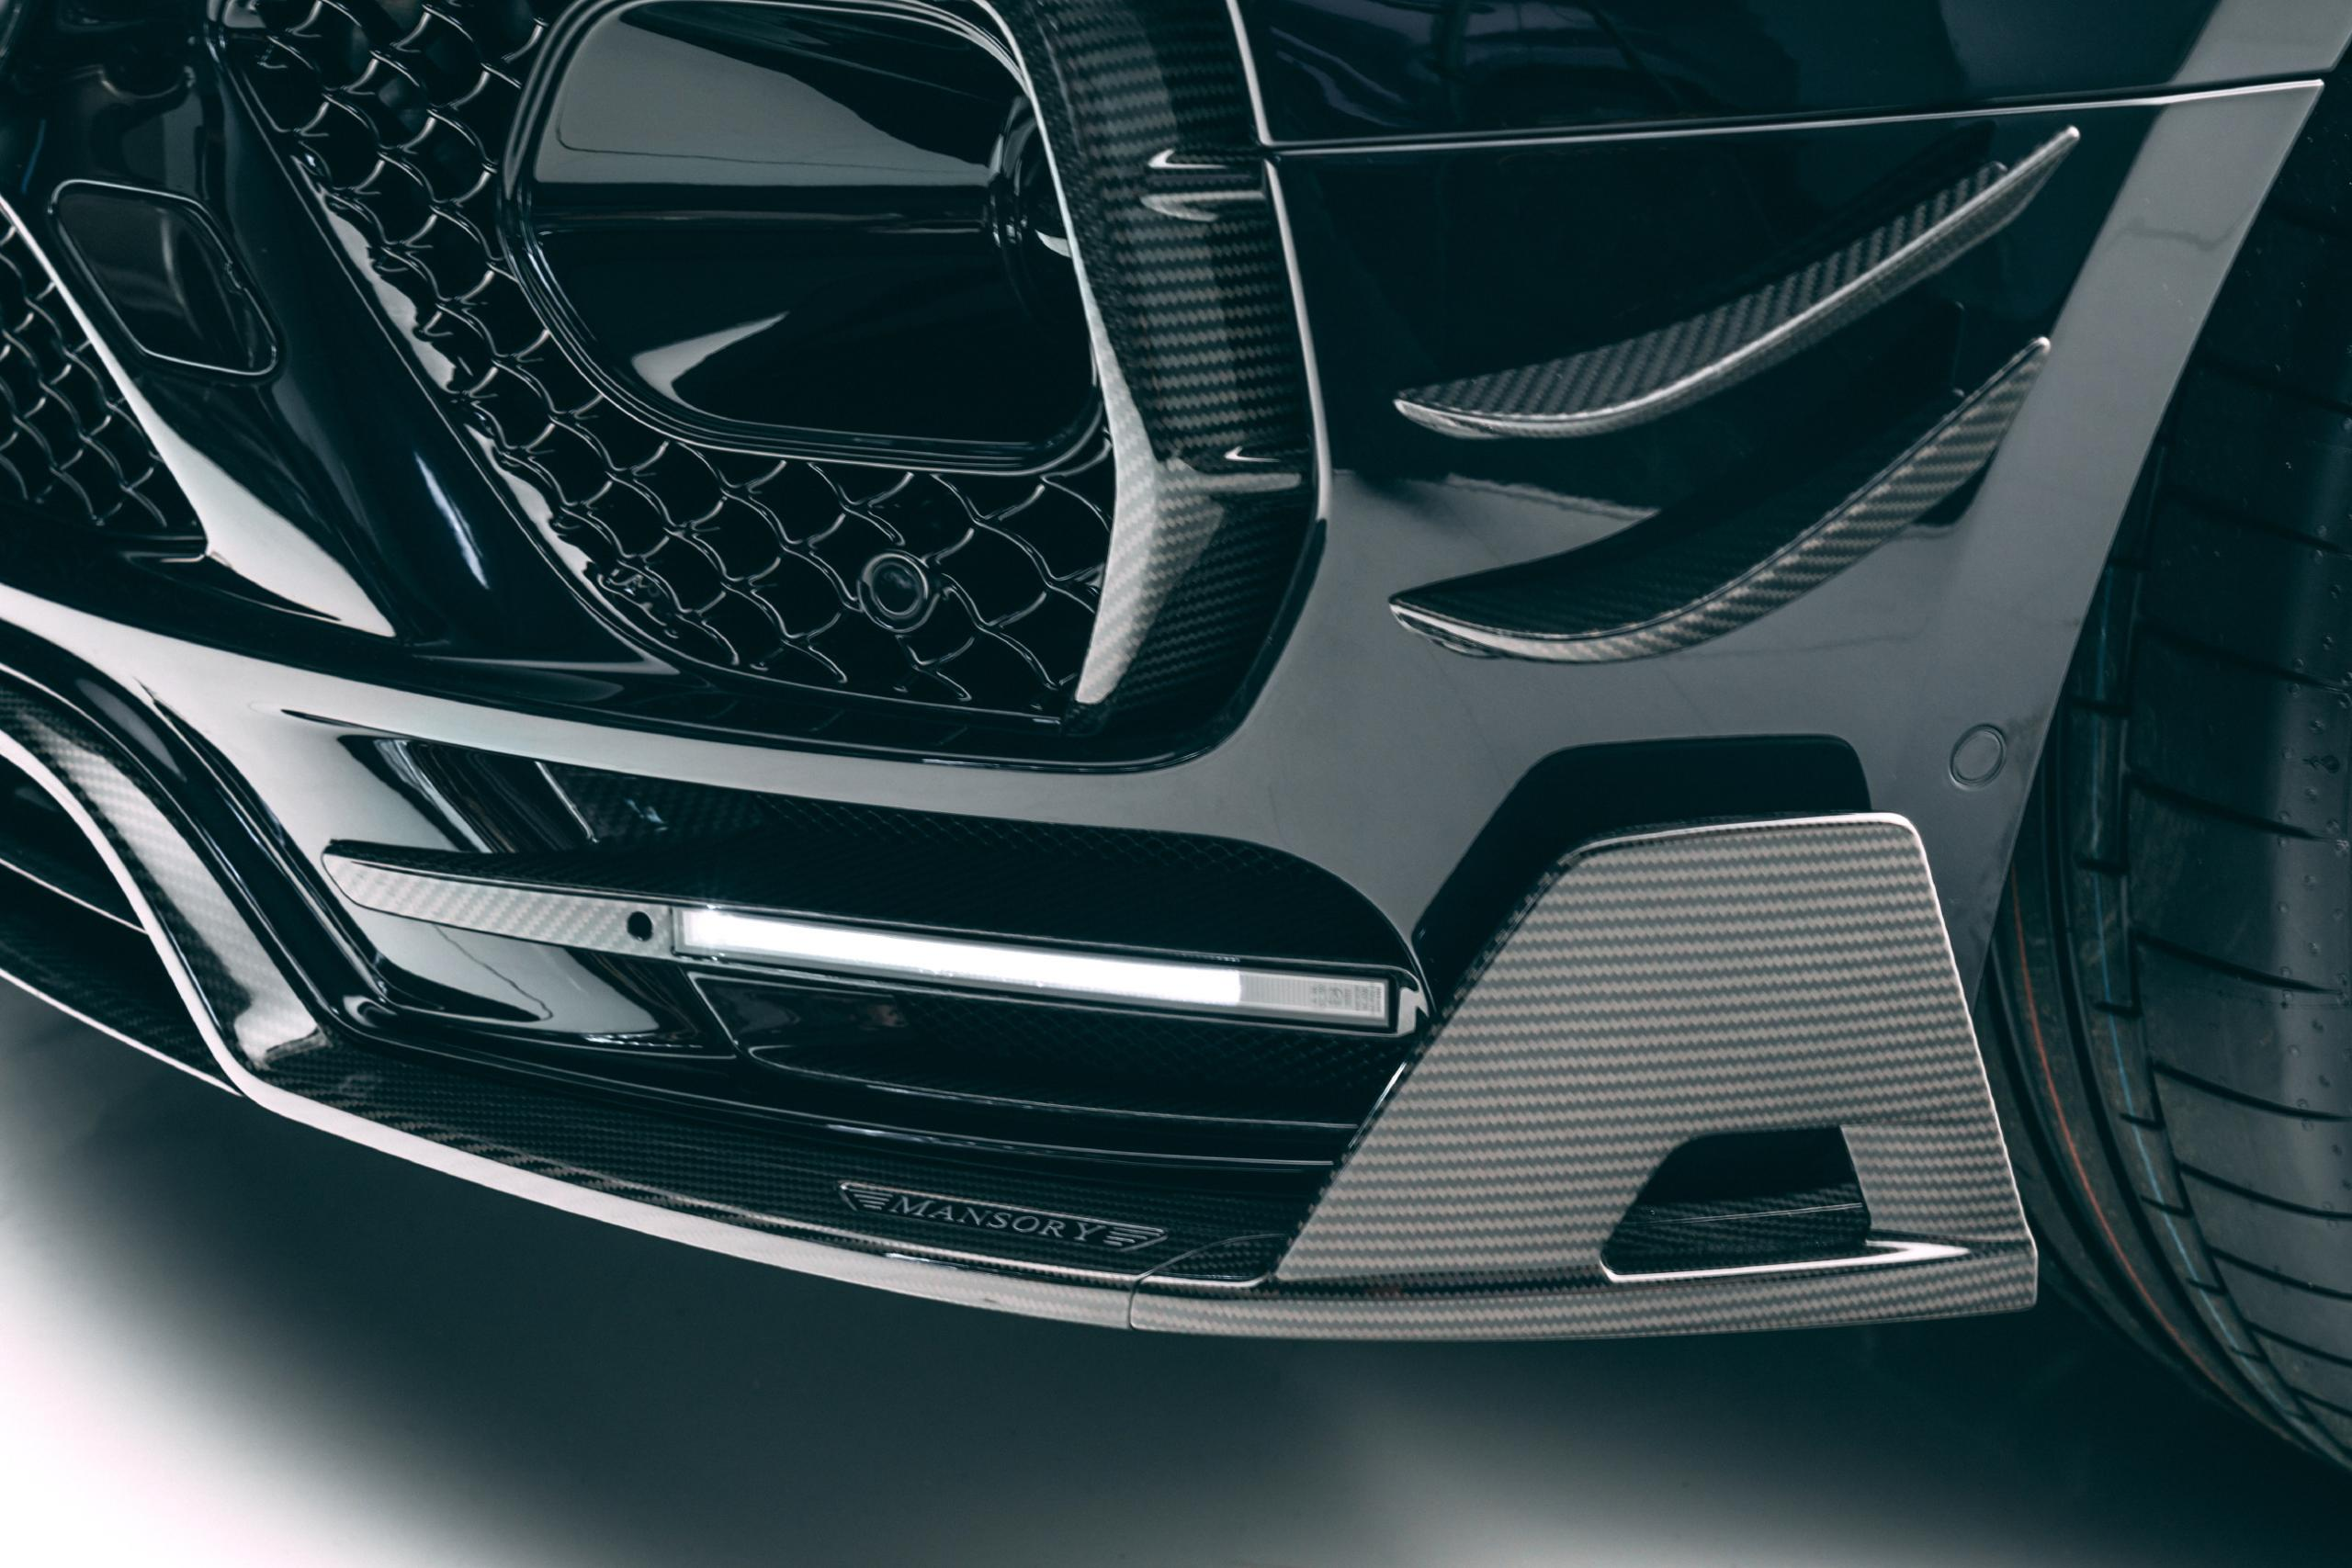 mansory new bentayga wide body kit carbon fiber front bumper led drl front lip spoiler 2021